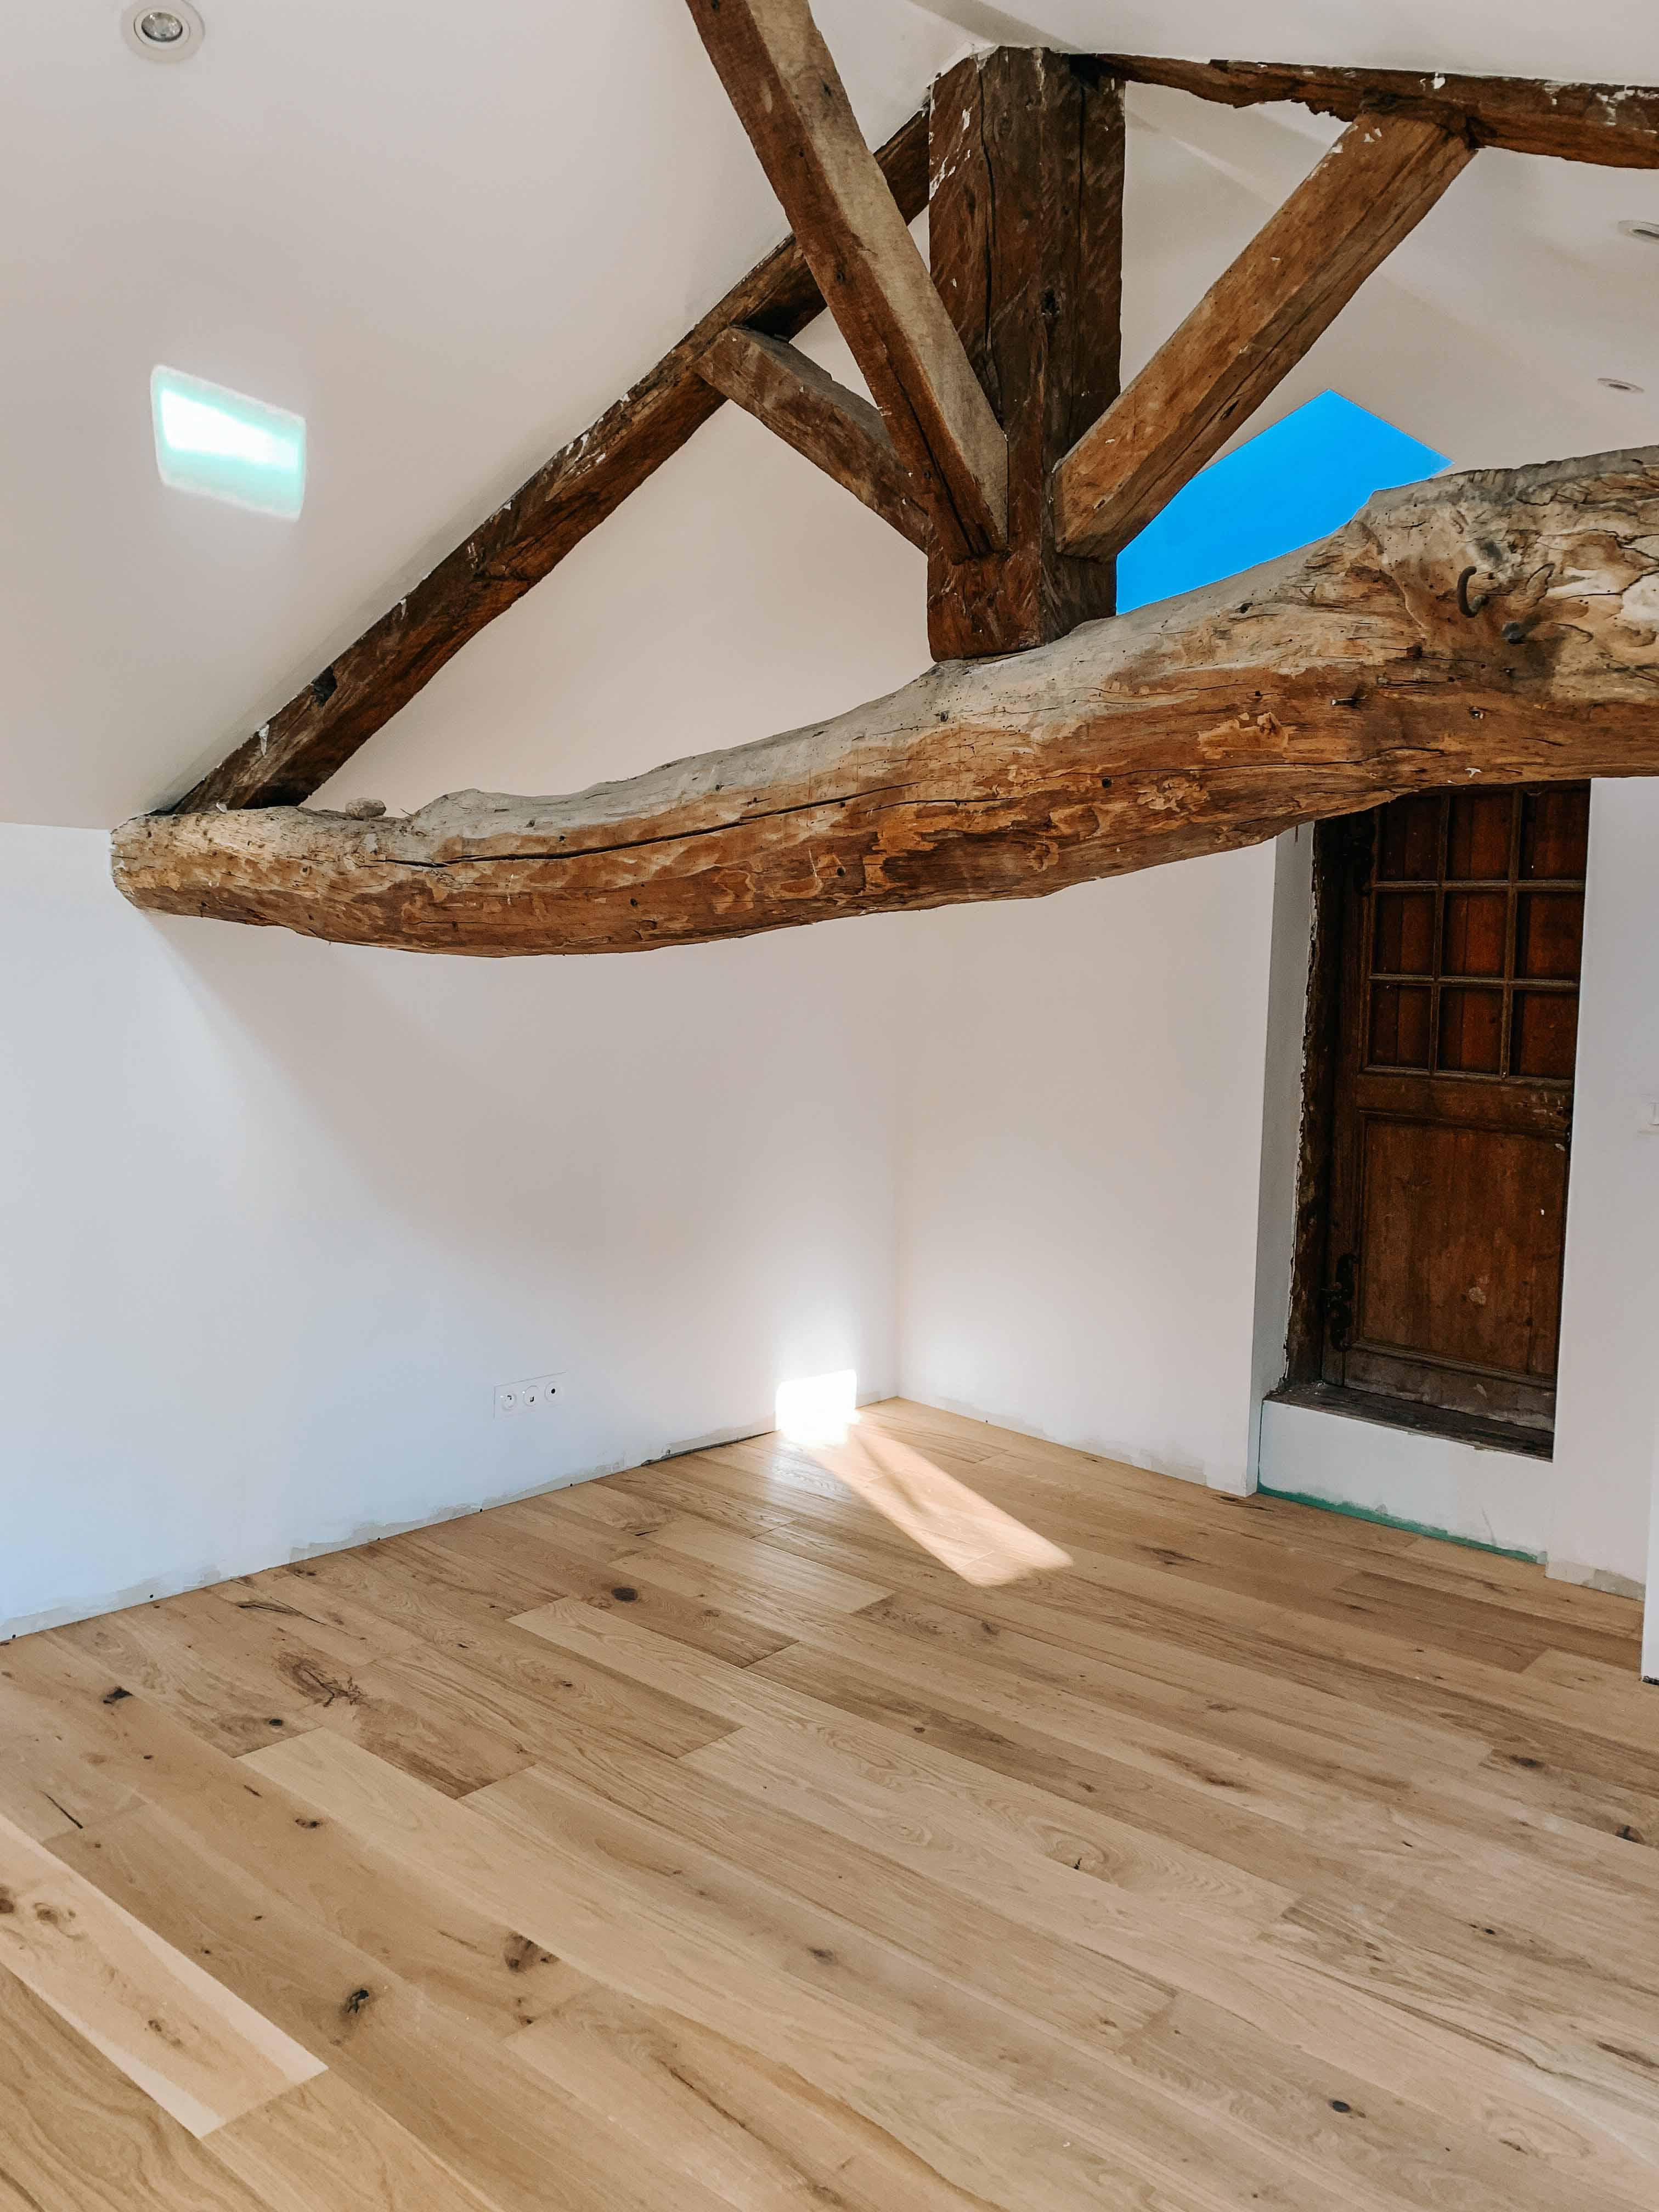 architecte-lyon-rénovation-presbytere-marcilly-azergues-pierre-dorée-38